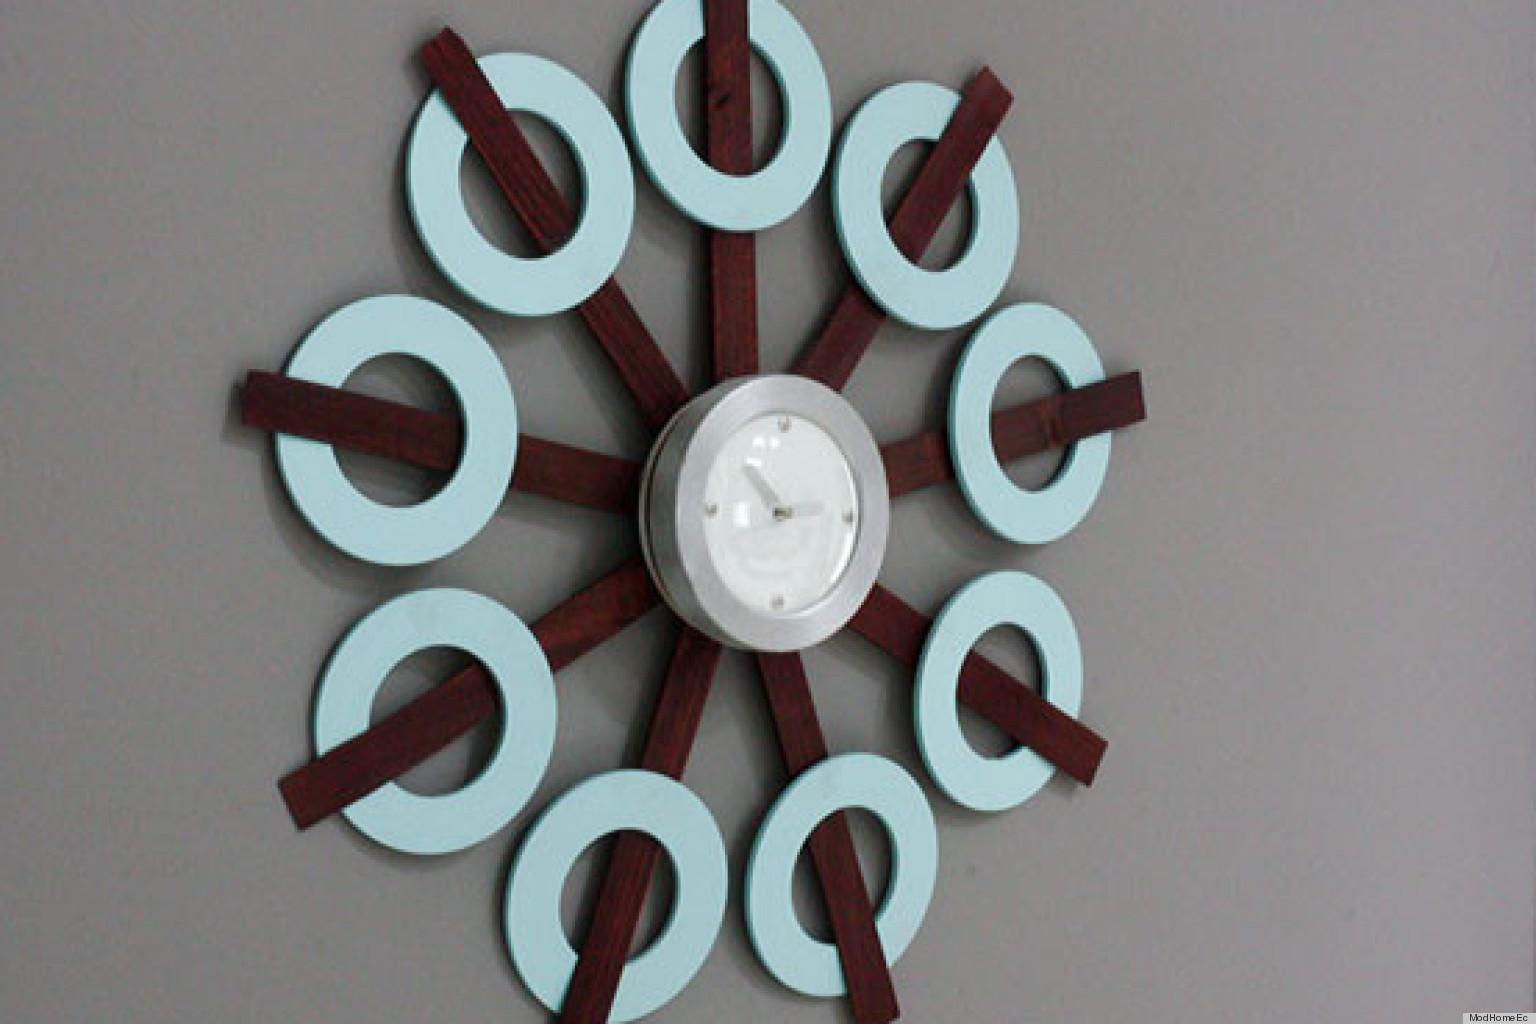 Make This Retro Inspired Clock Diy With Wood Shims